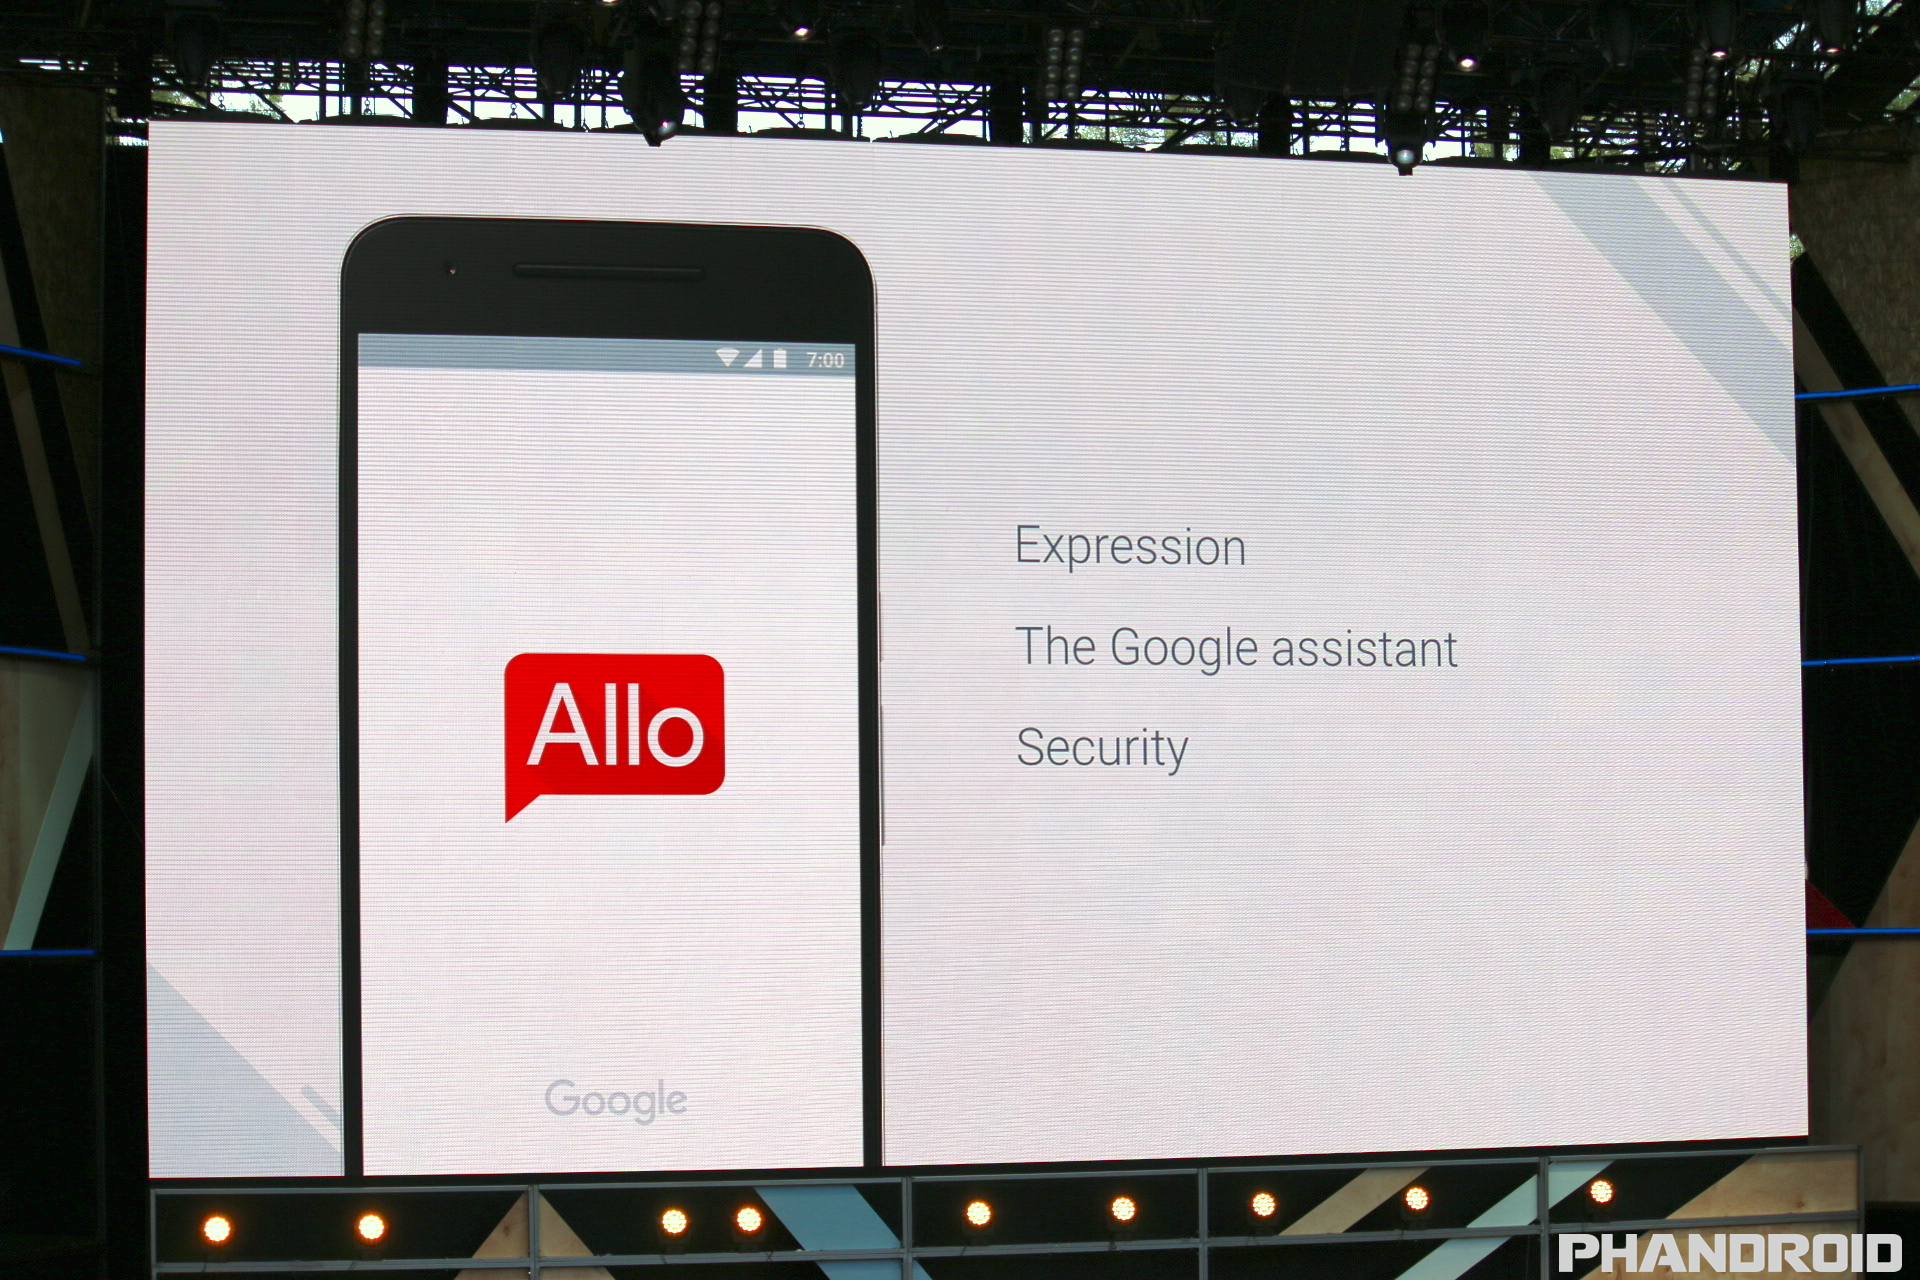 Allo app by Google